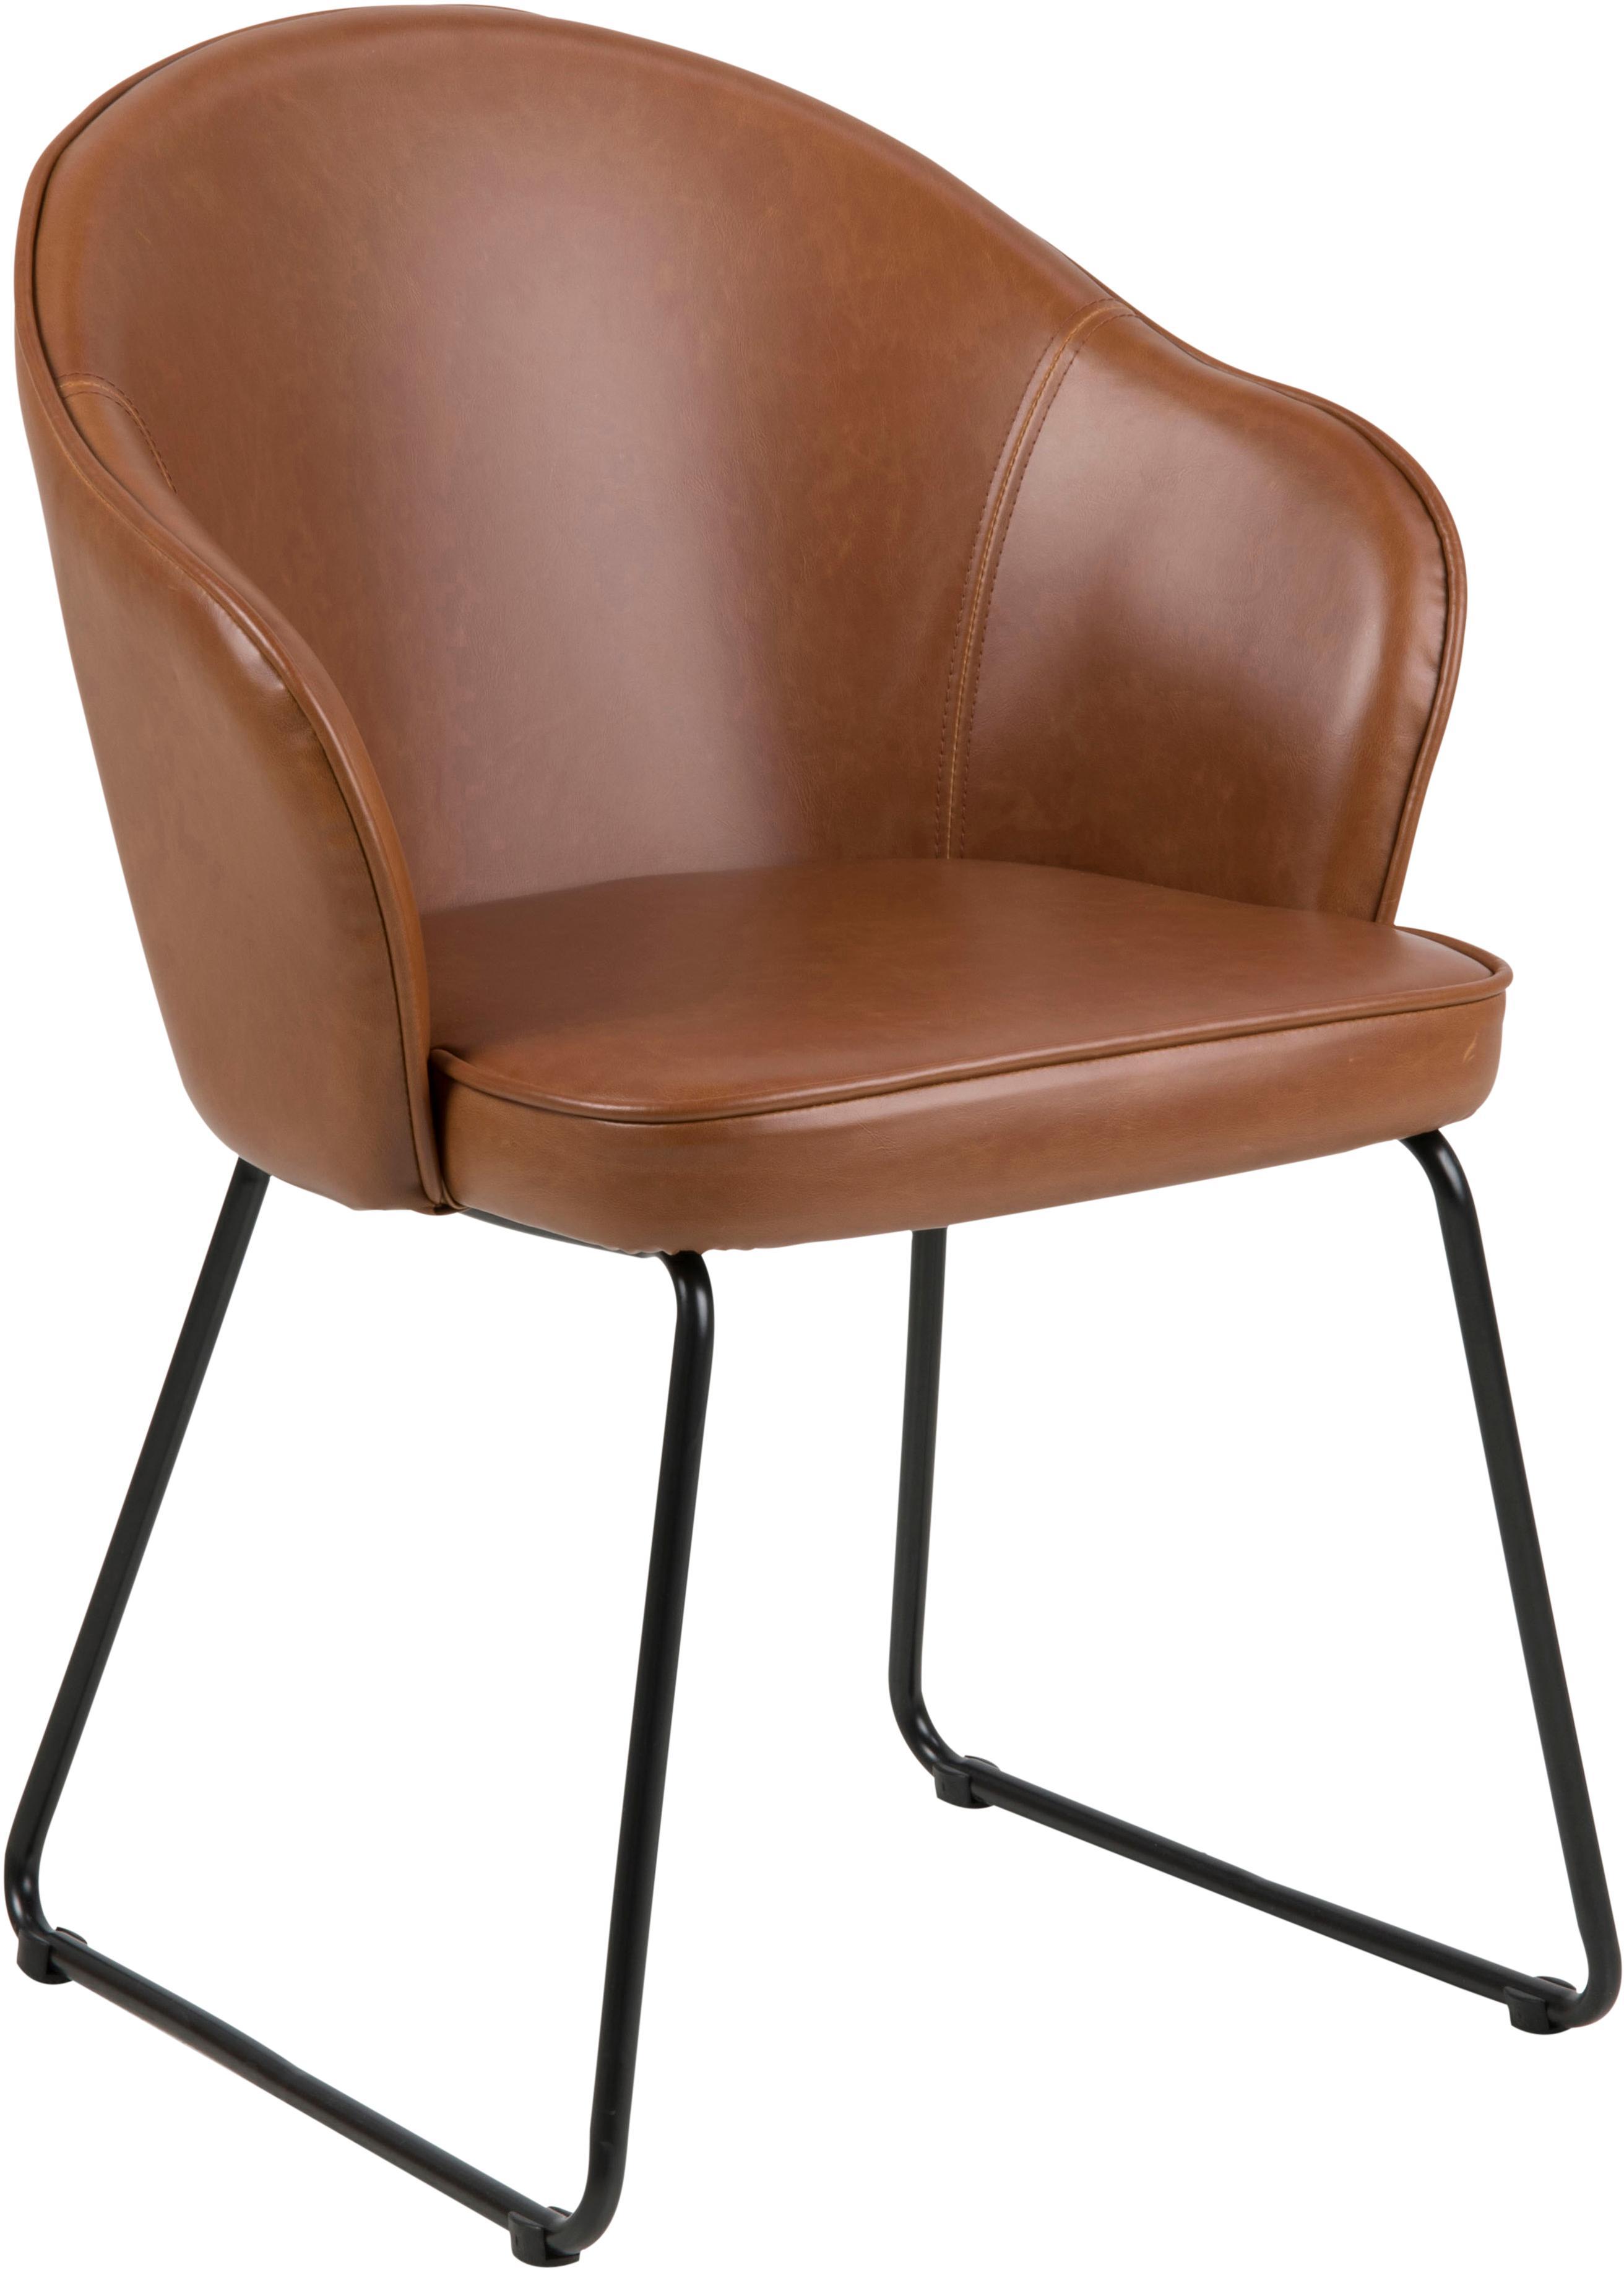 Silla con reposabrazos de cuero sintético Mitzie, Tapizado: poliuretano (cuero sintét, Patas: metal, pintado, Coñac, negro, An 57 x F 59 cm